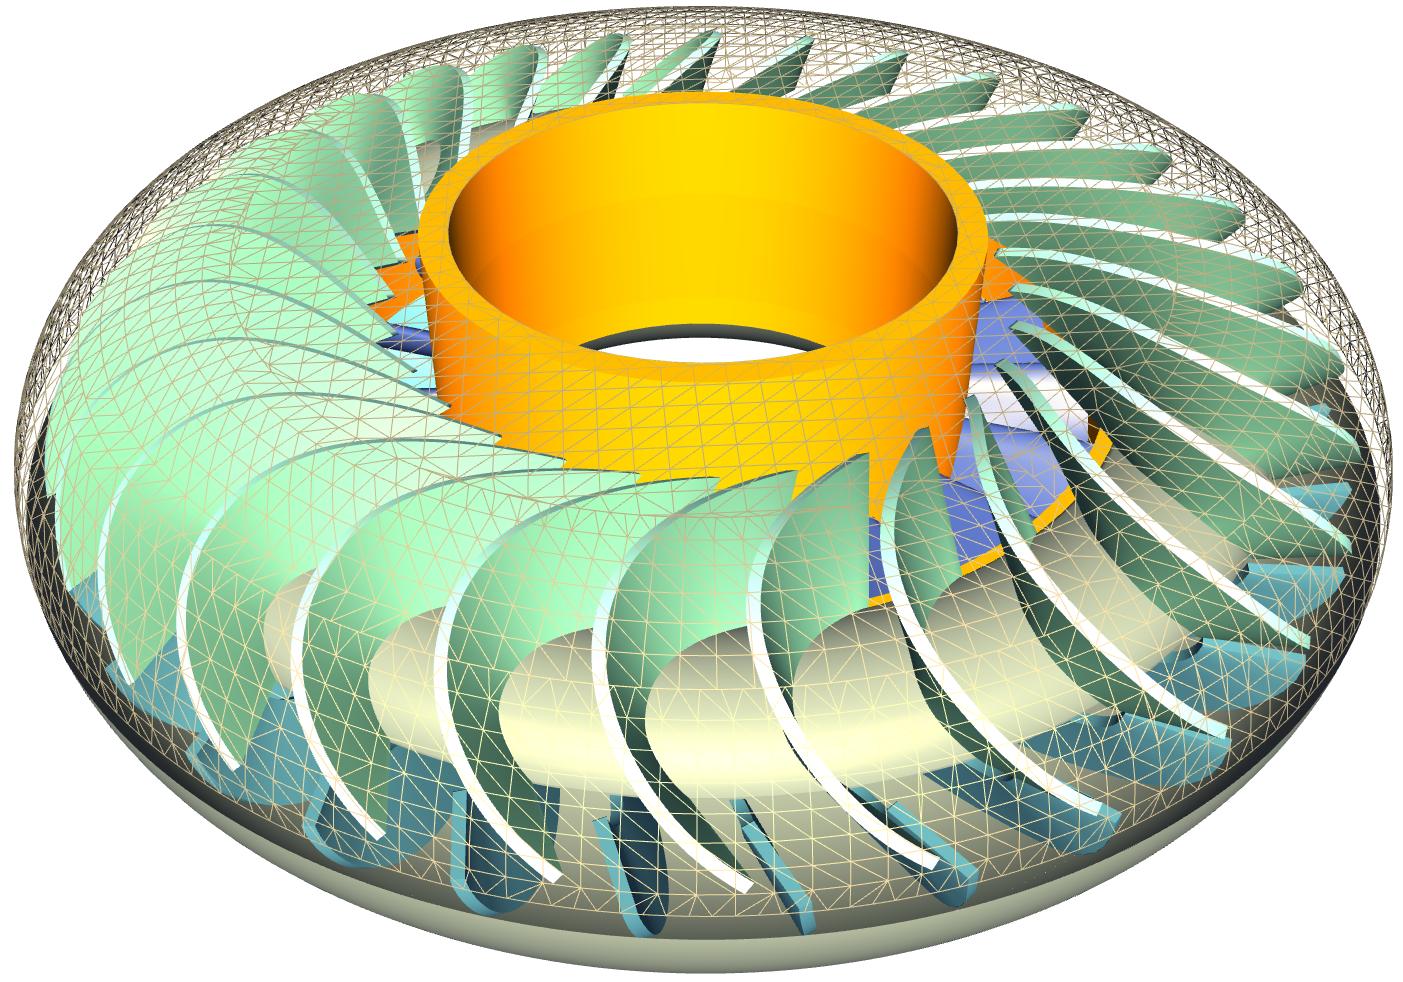 Design And Optimization Of Torque Converters Caeses